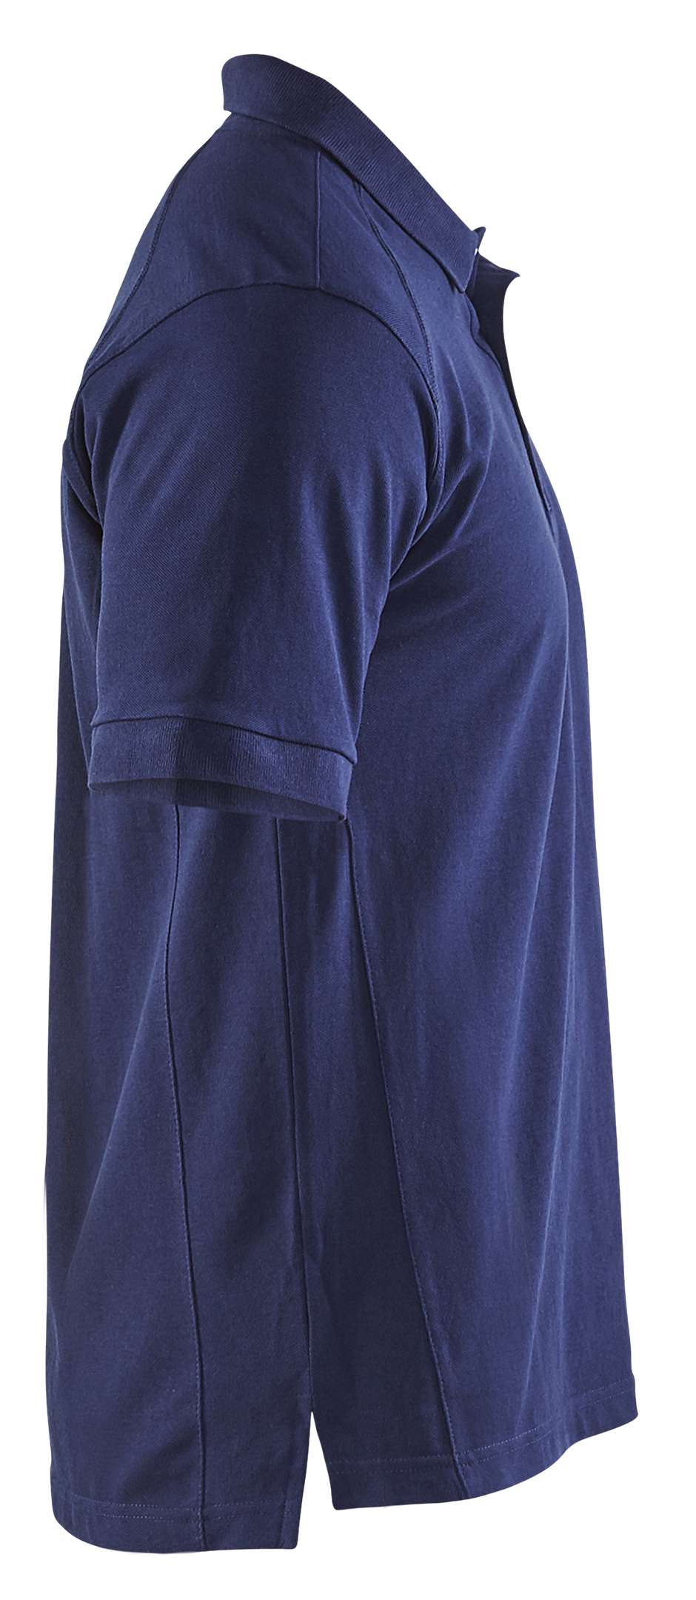 Blaklader Polo shirts 33241050 marineblauw(8900)